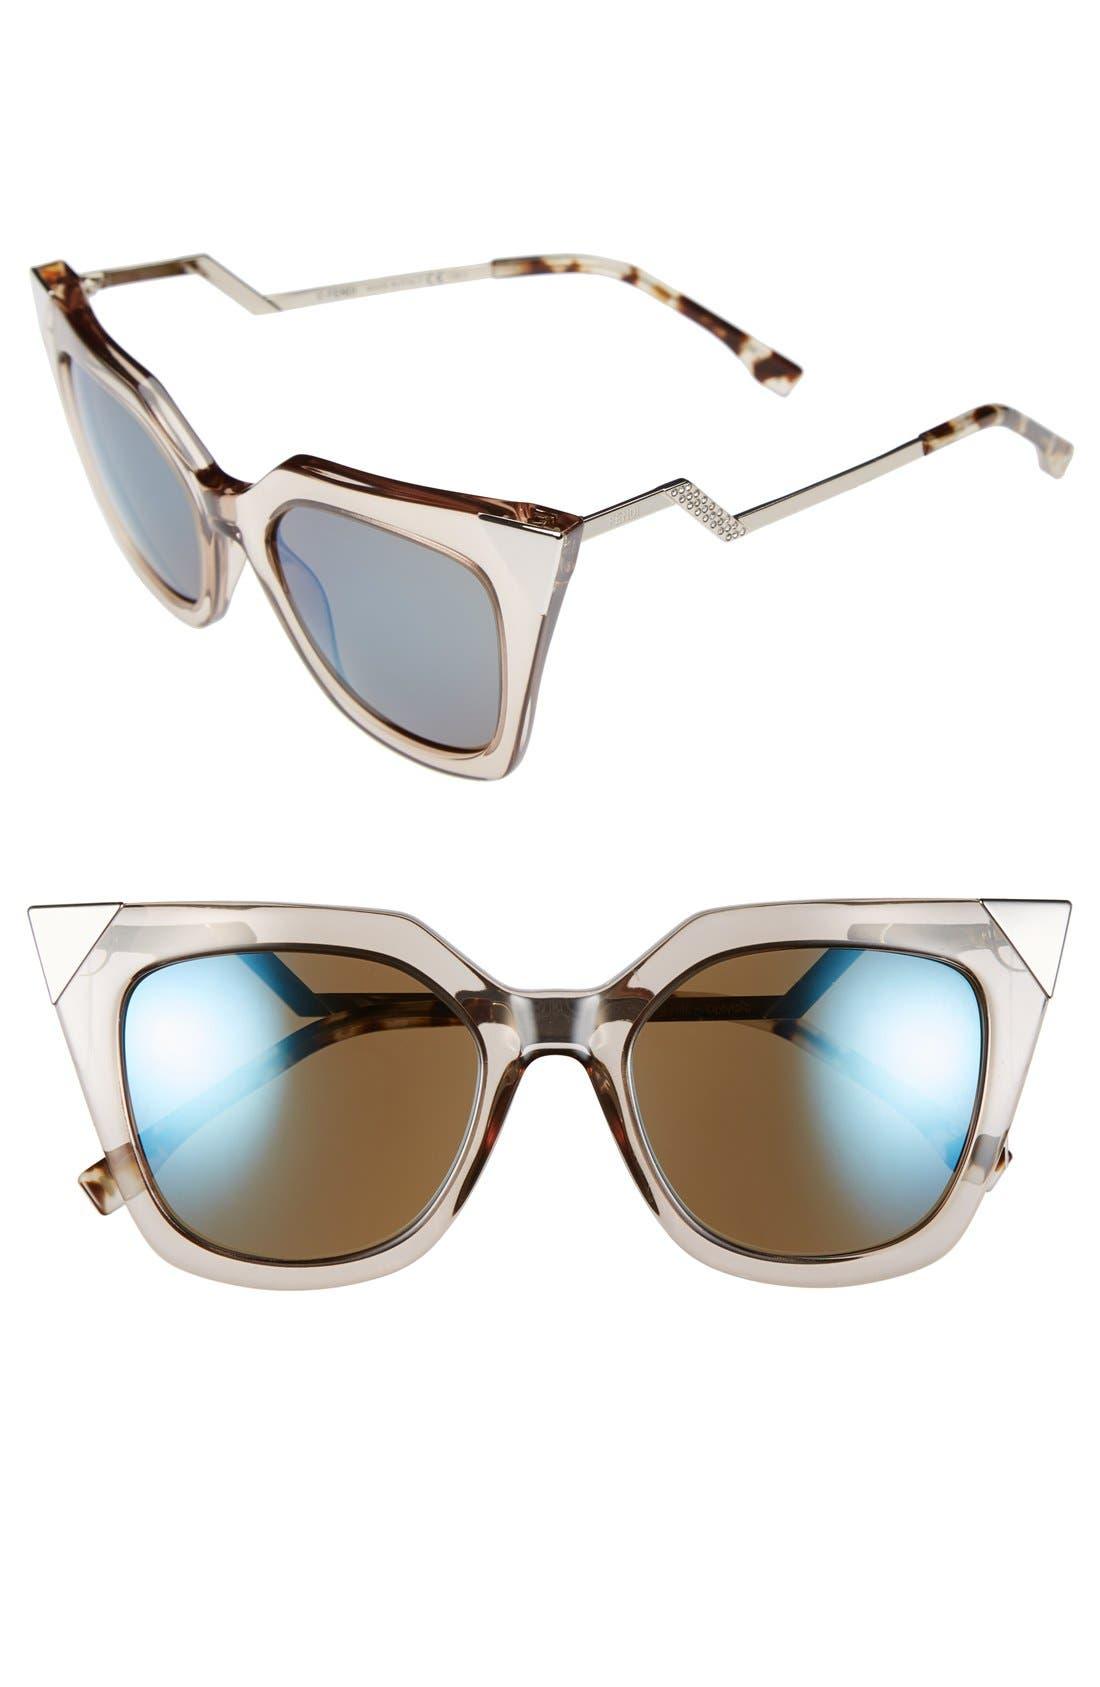 52mm Cat Eye Sunglasses,                         Main,                         color, Dove Grey